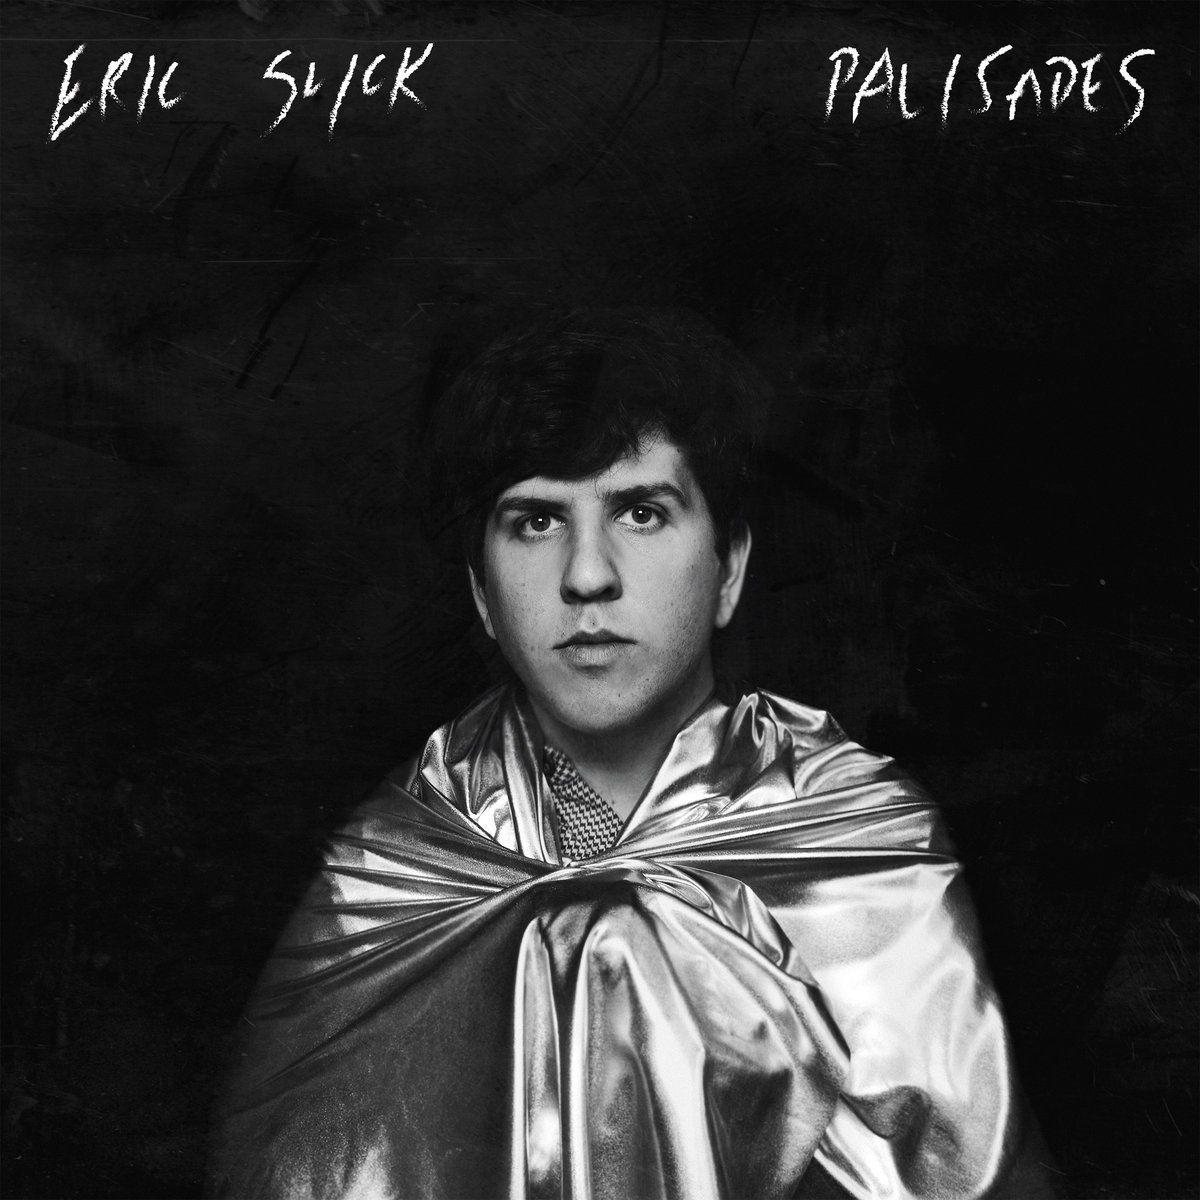 eric slick palisades stream album listen Dr. Dogs Eric Slick premieres debut album Palisades: Stream